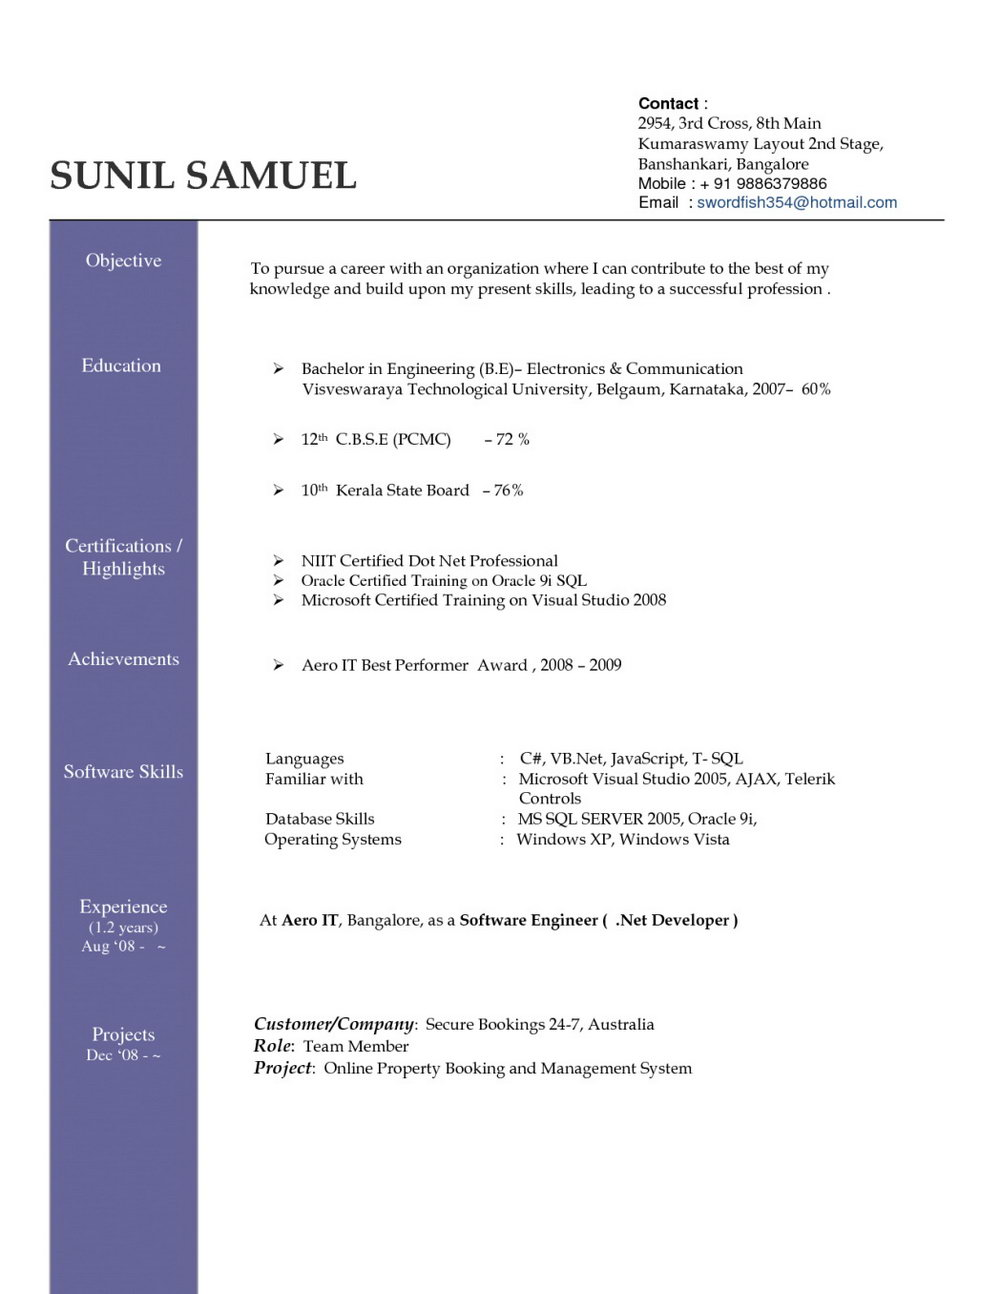 Resume Format Doc File Free Download